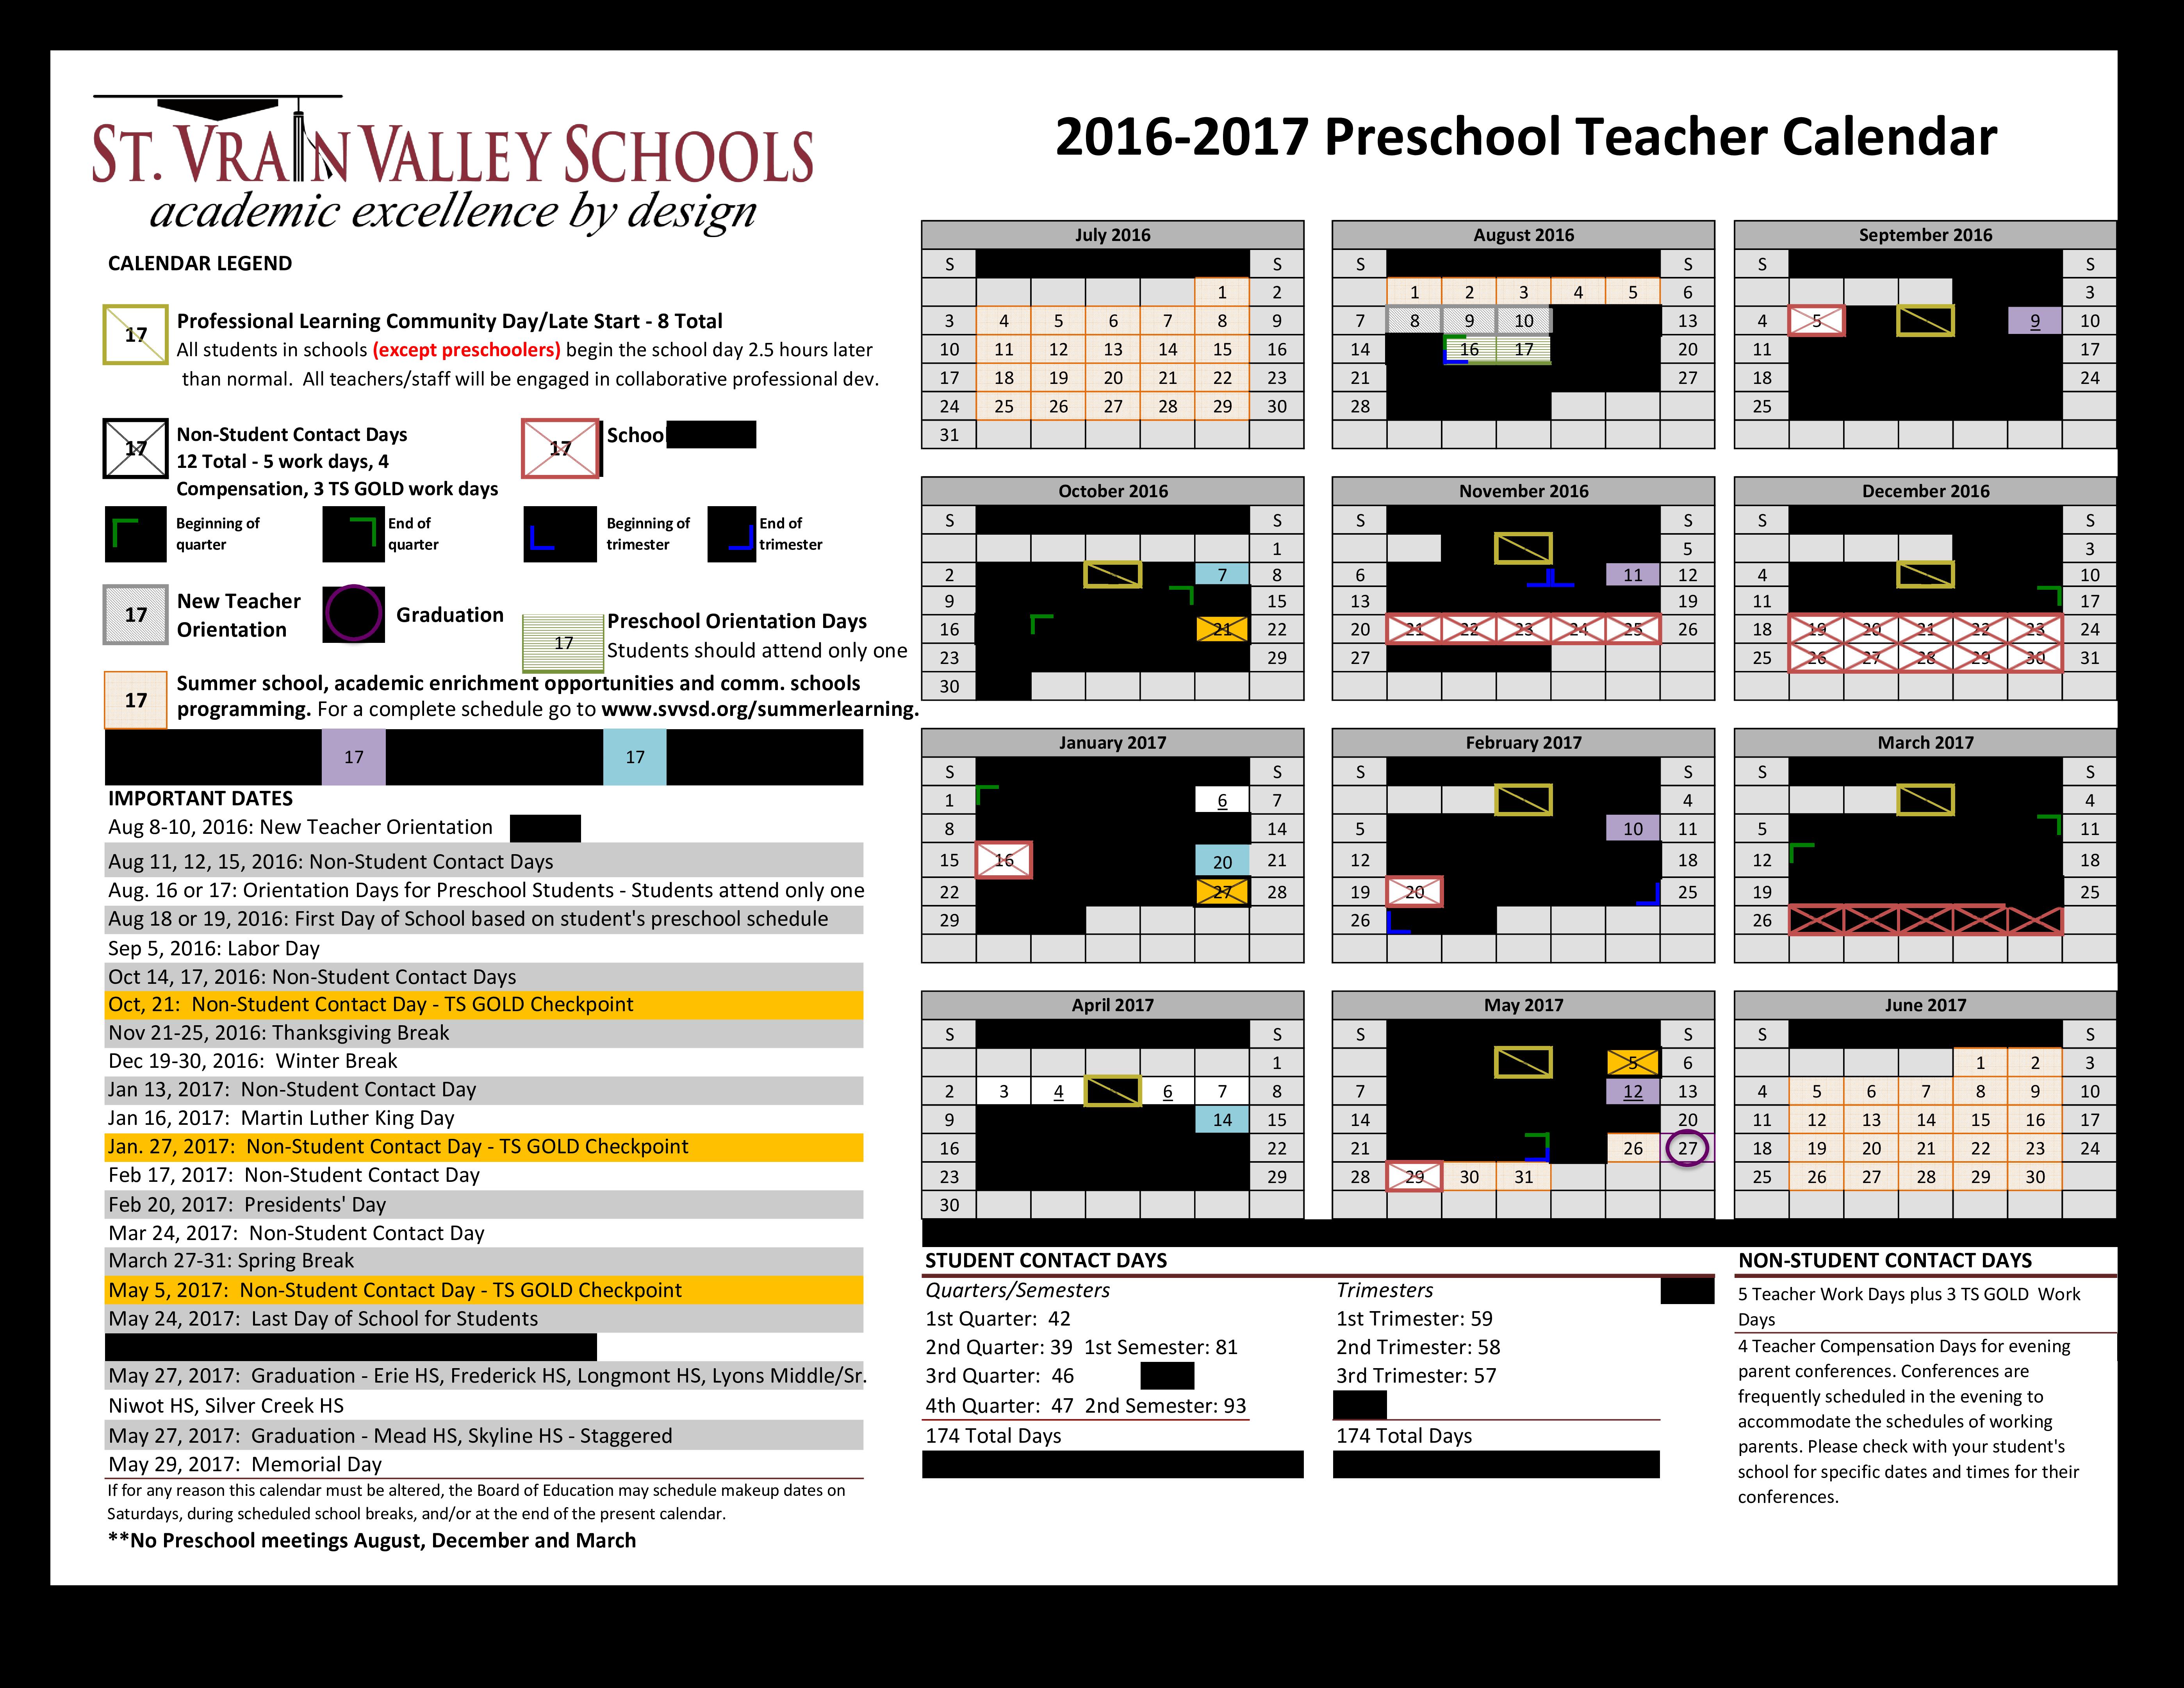 Free Preschool Teacher Calendar Templates At Allbusinesstemplates